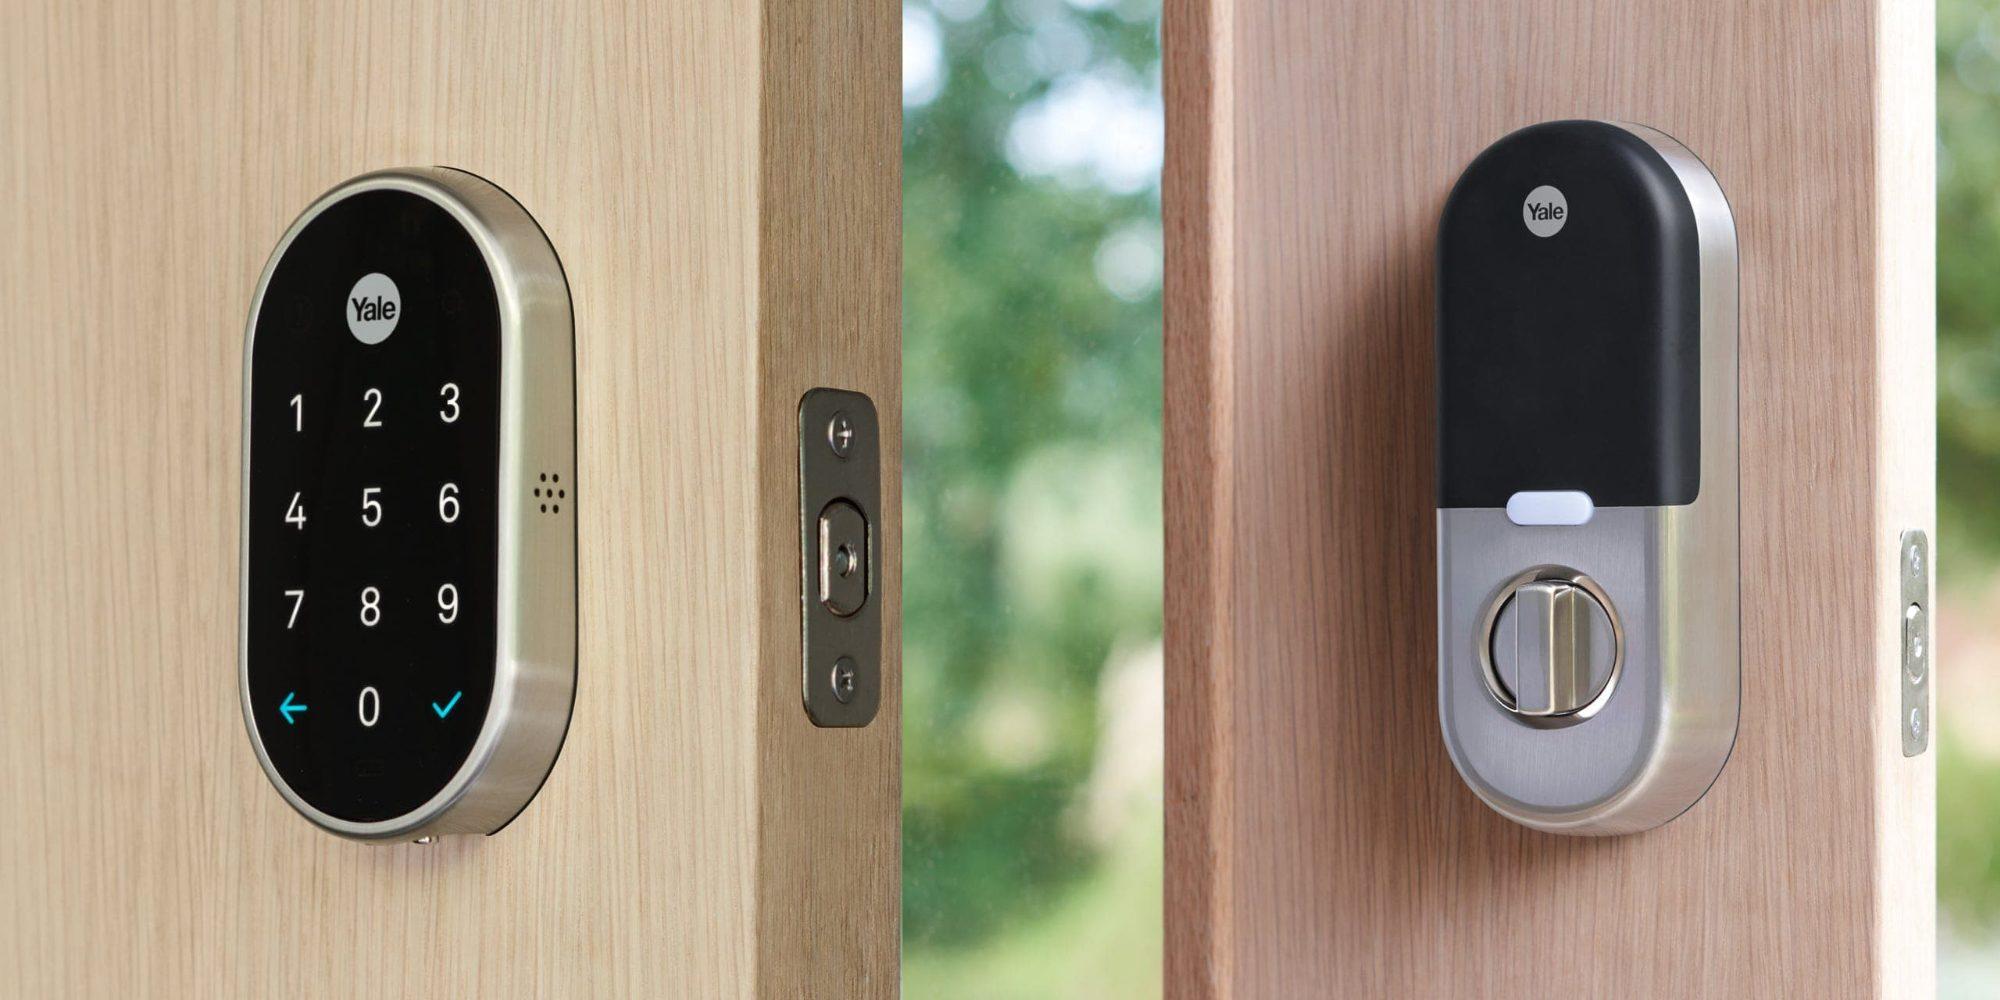 9to5Toys Letzter Anruf: Lenovo Chromebook & Home Mini 549, Lenovo Smart Displays ab 85, TP-Link Smart Power Strip 55, mehr